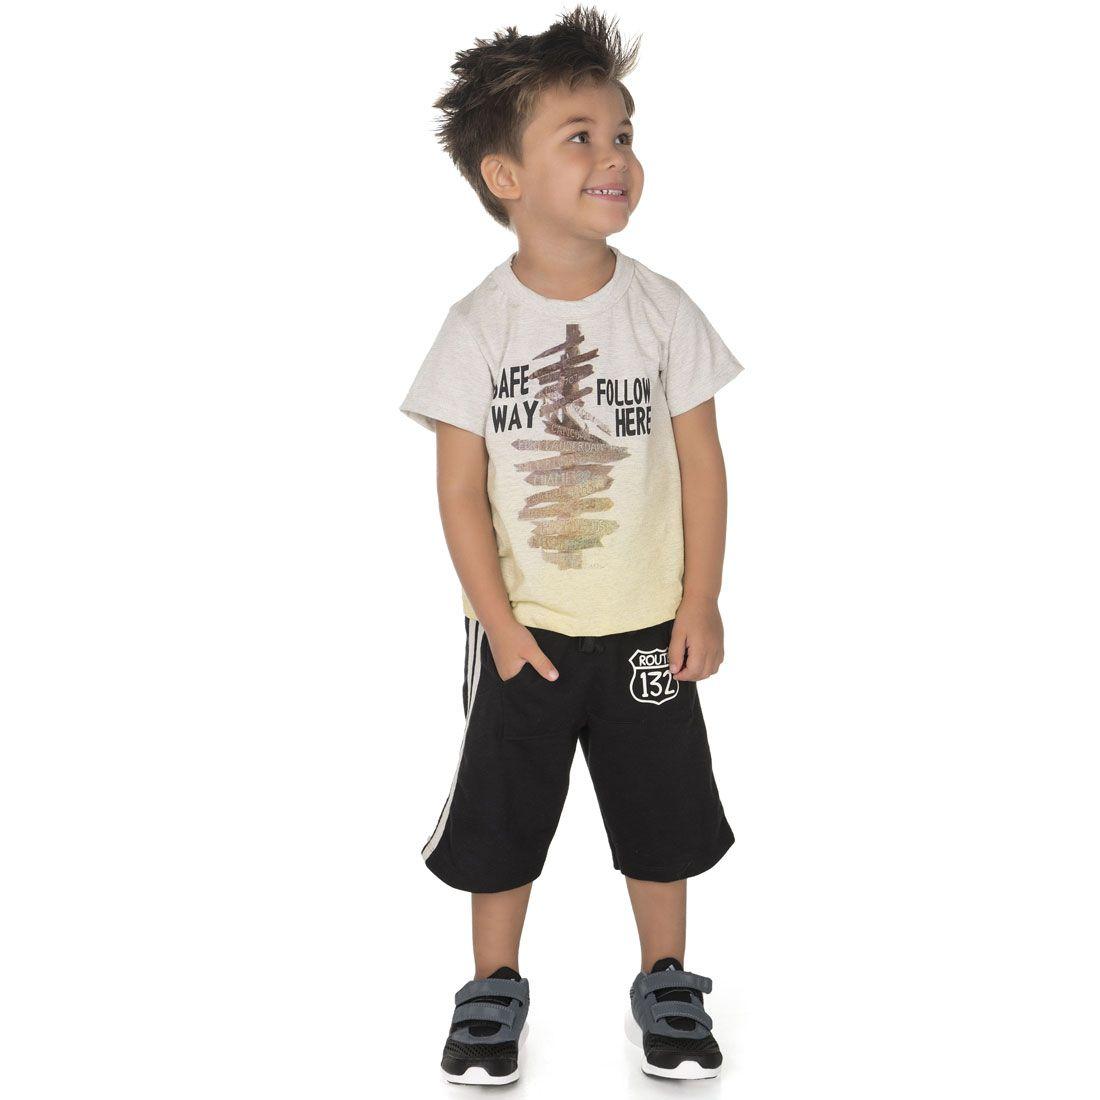 Conjunto Alekids  Regata e Camiseta Safe way